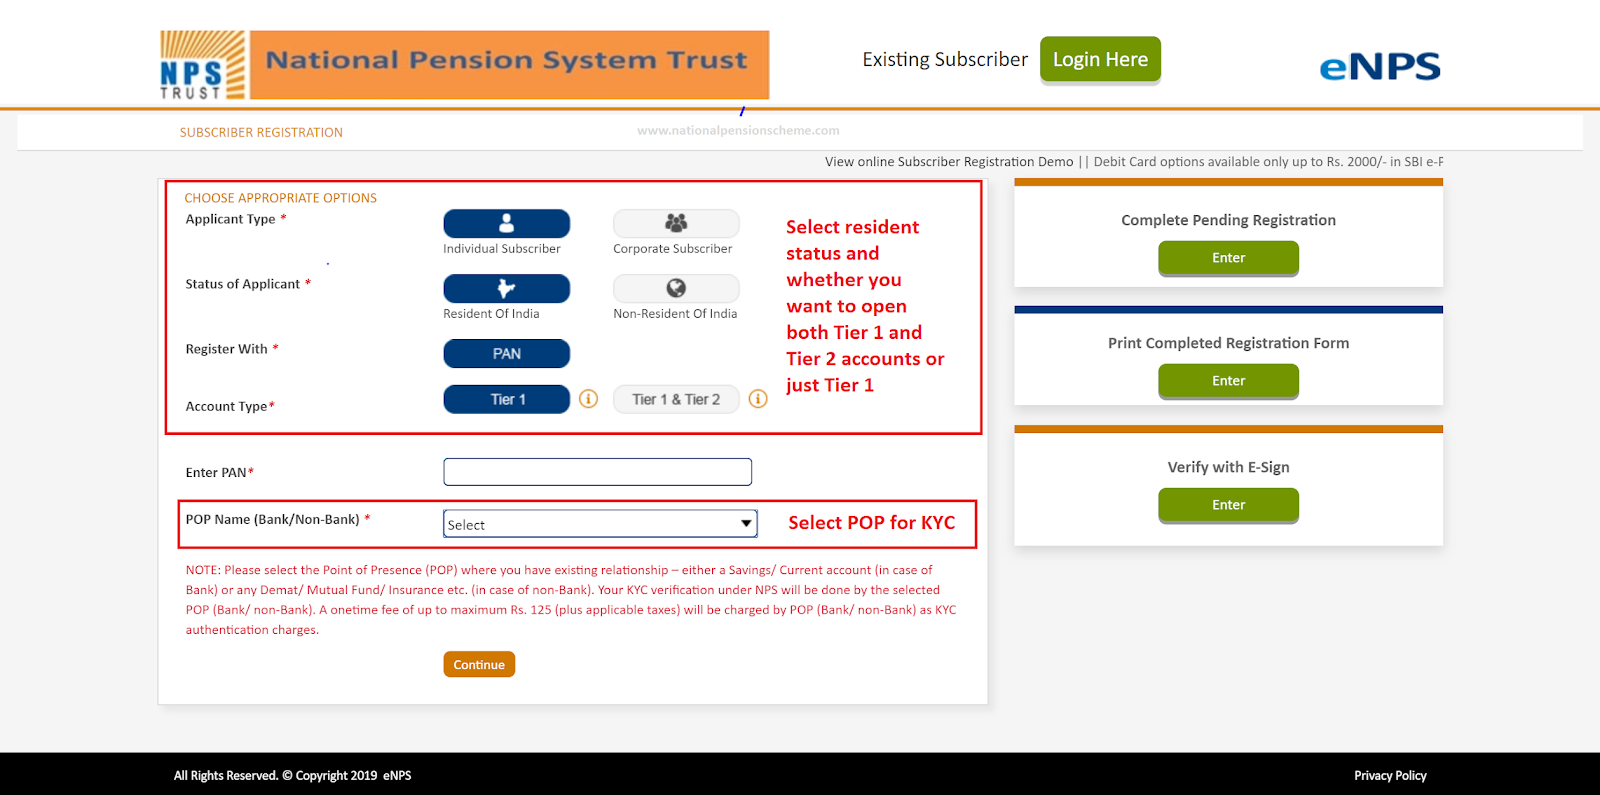 Screenshot of eNPS online registration screen on Karvy portal